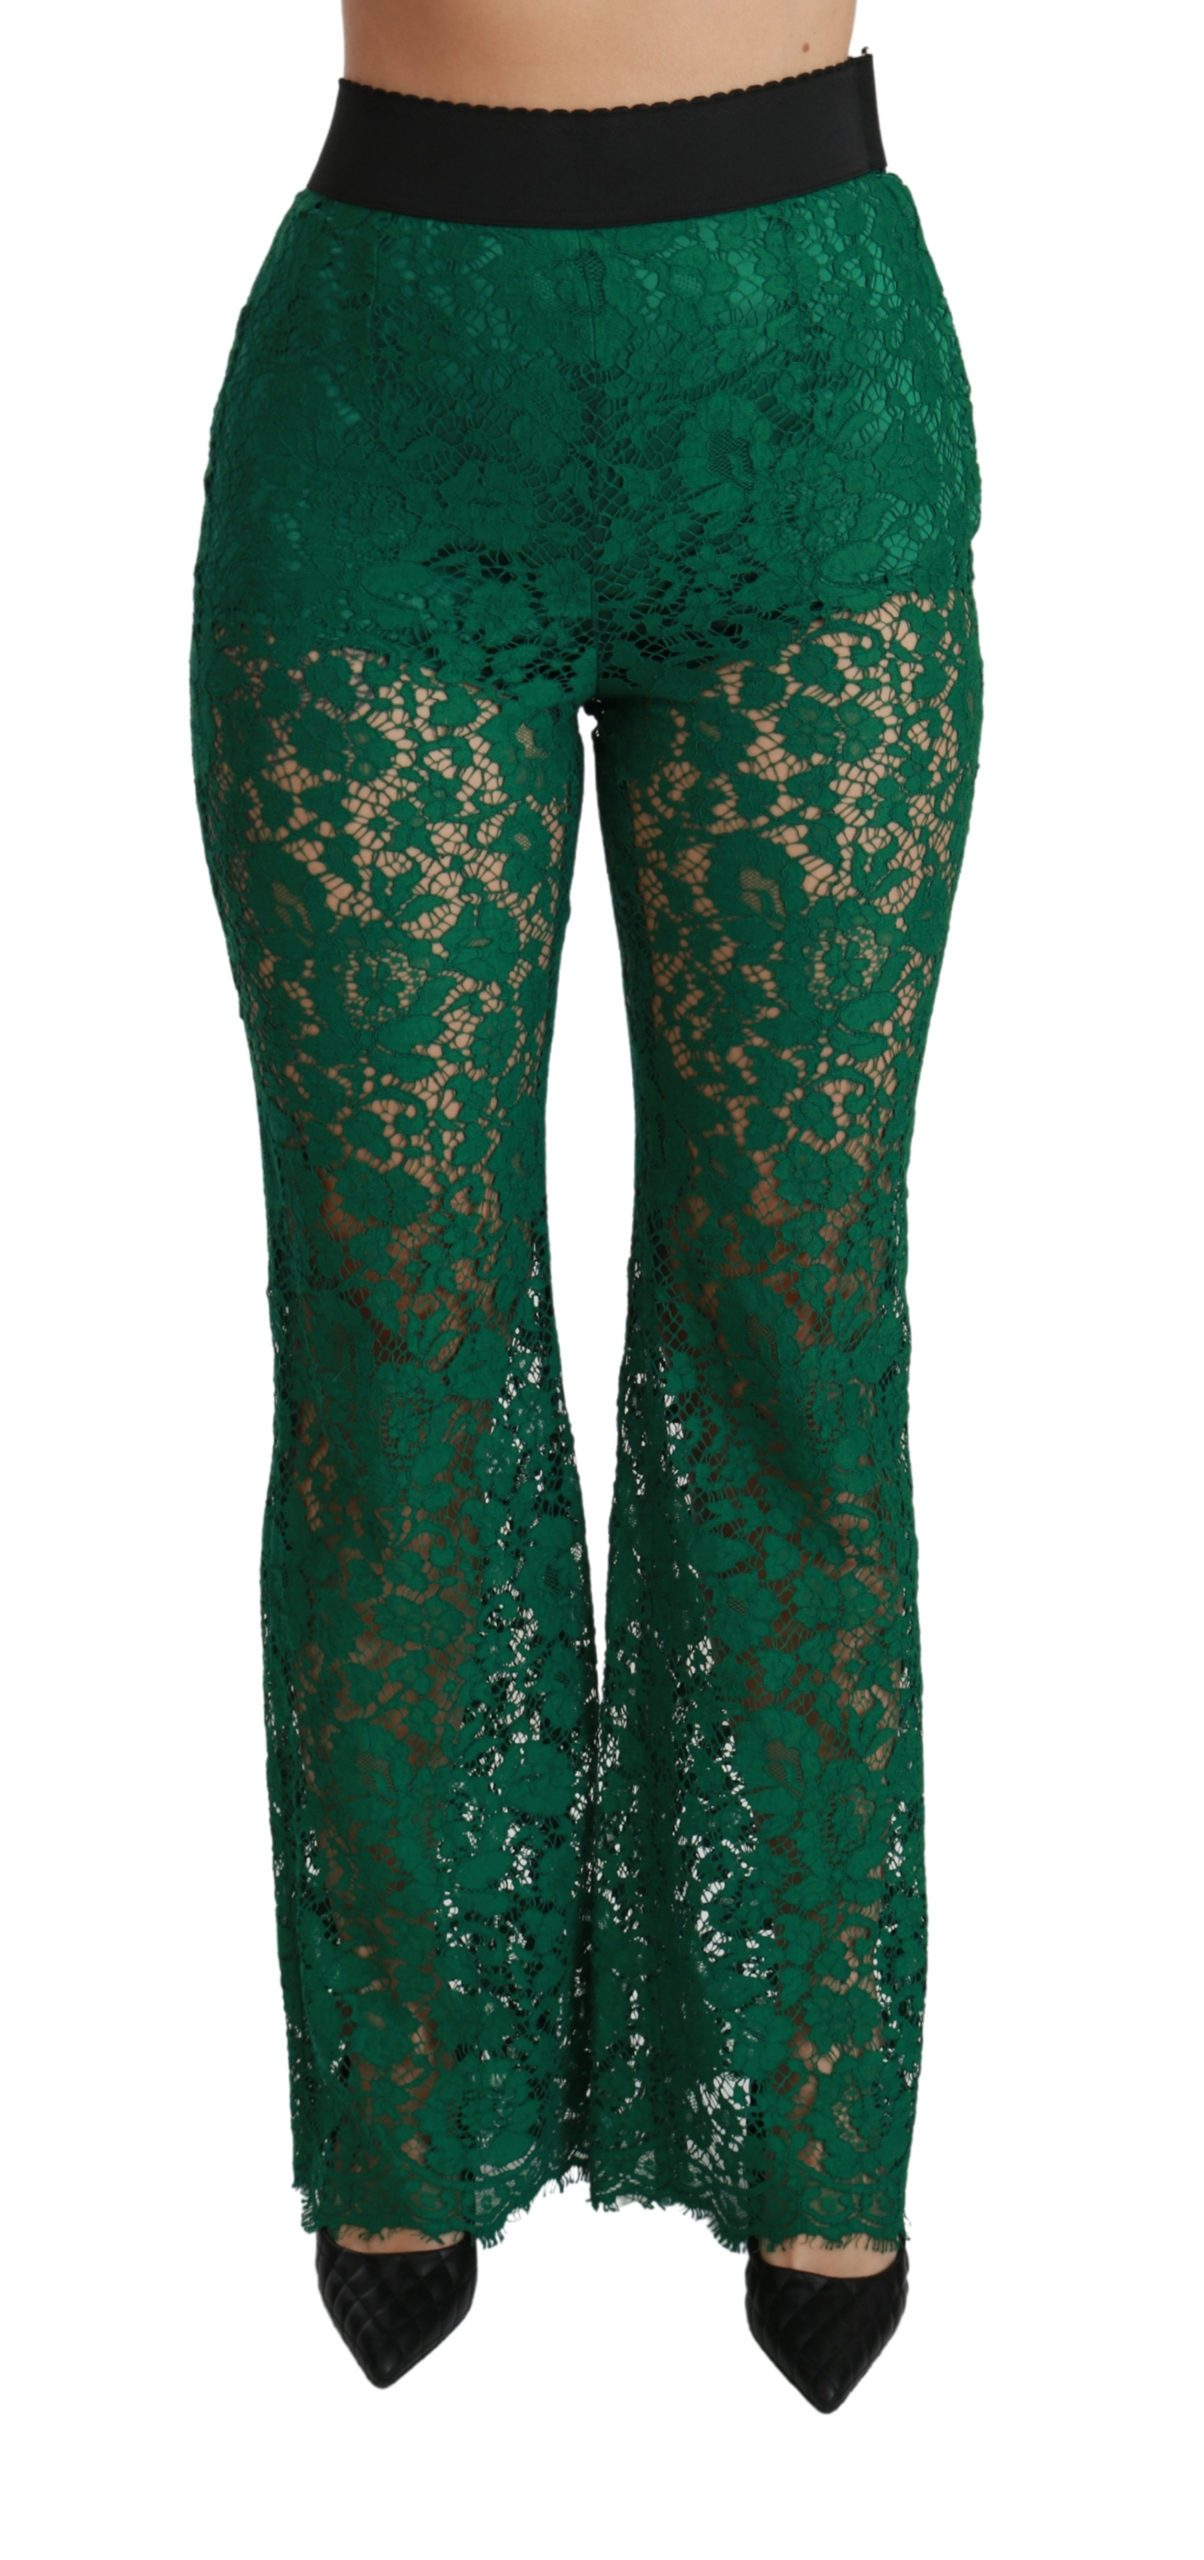 Dolce & Gabbana Women's Lace High Waist Flared Trouser Green PAN70824 - IT40|S